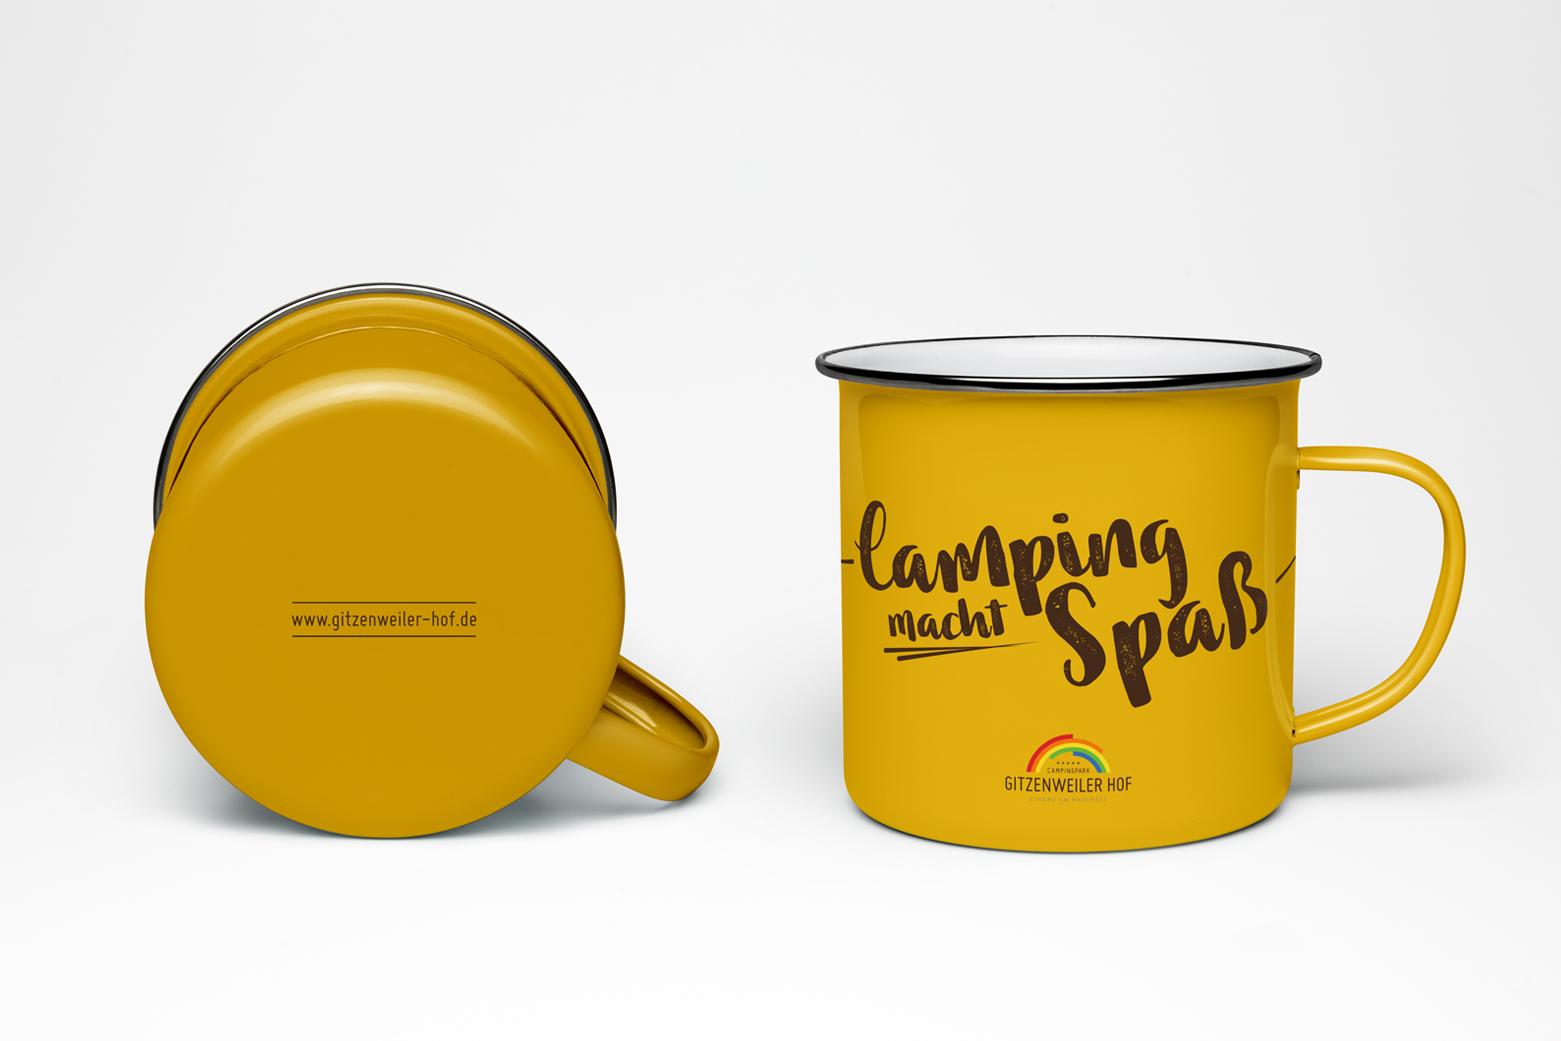 HINTERLAND Gitzenweiler Hof Camping Tasse